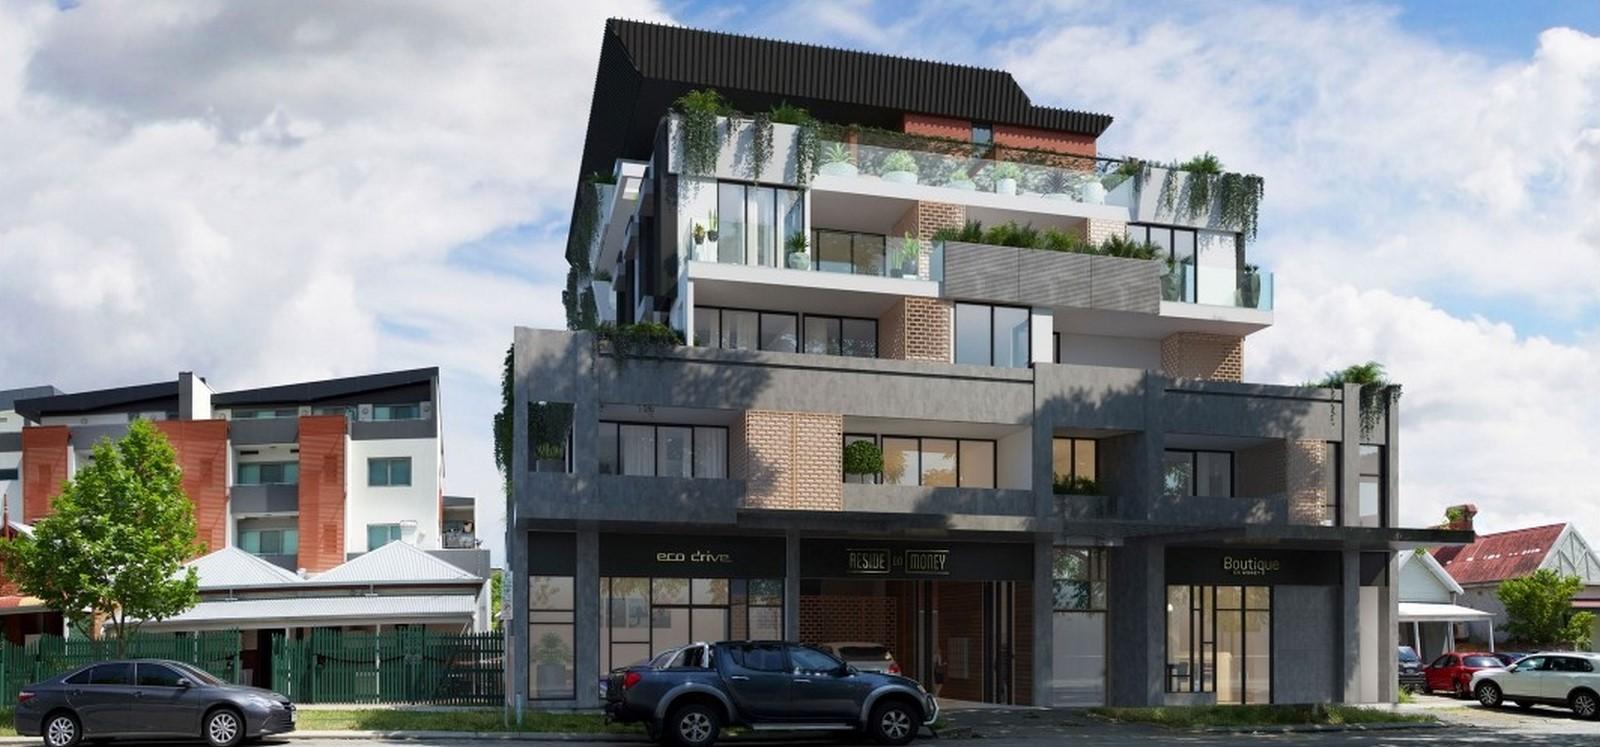 Money Street Apartments - Sheet1